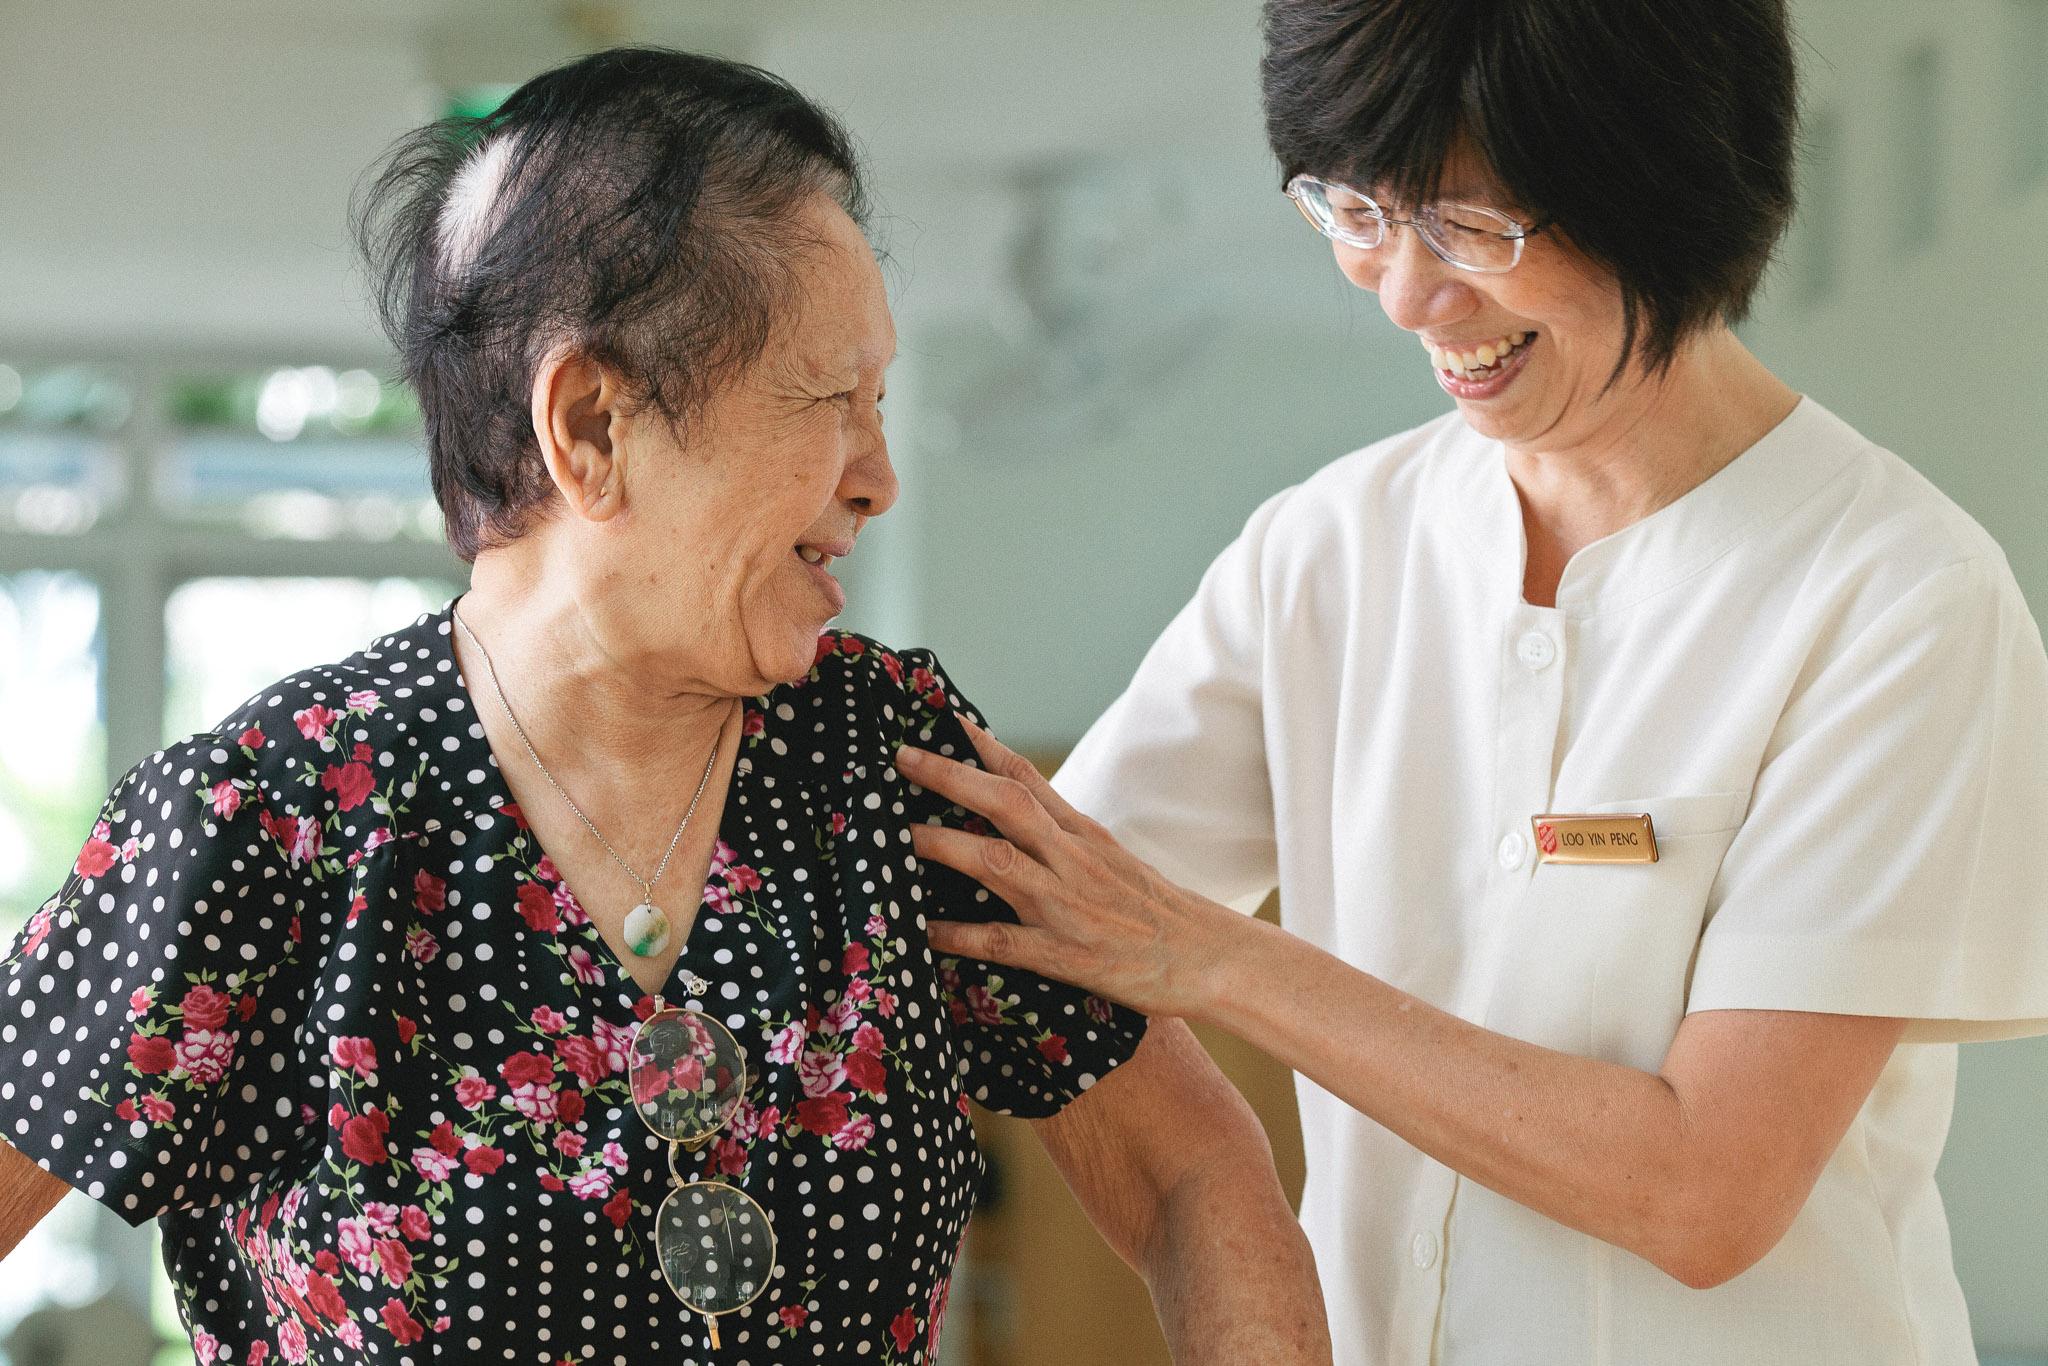 singapore-photographer-hospice-care-008.jpg